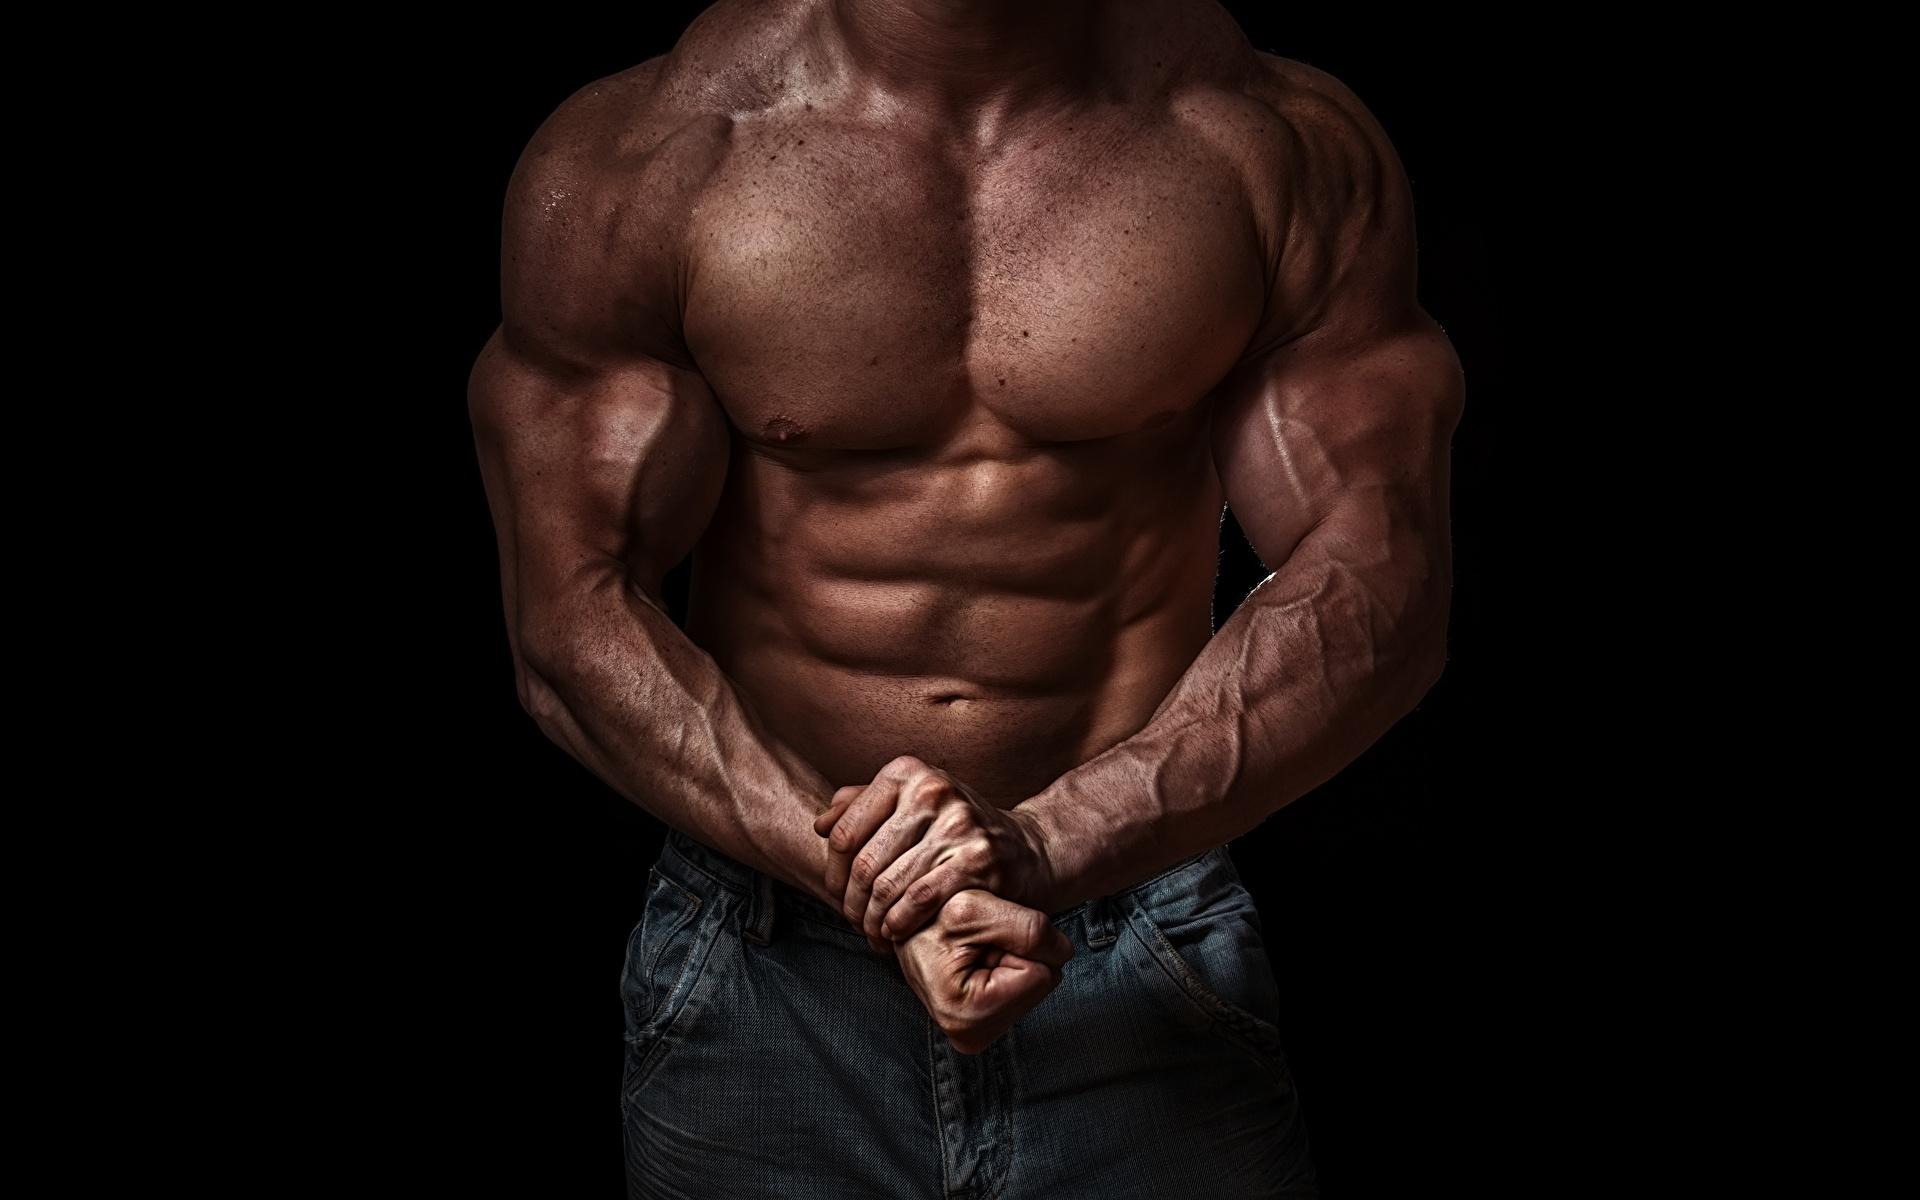 Обои Мышцы Спорт Бодибилдинг Руки Живот Черный фон 1920x1200 мускулы